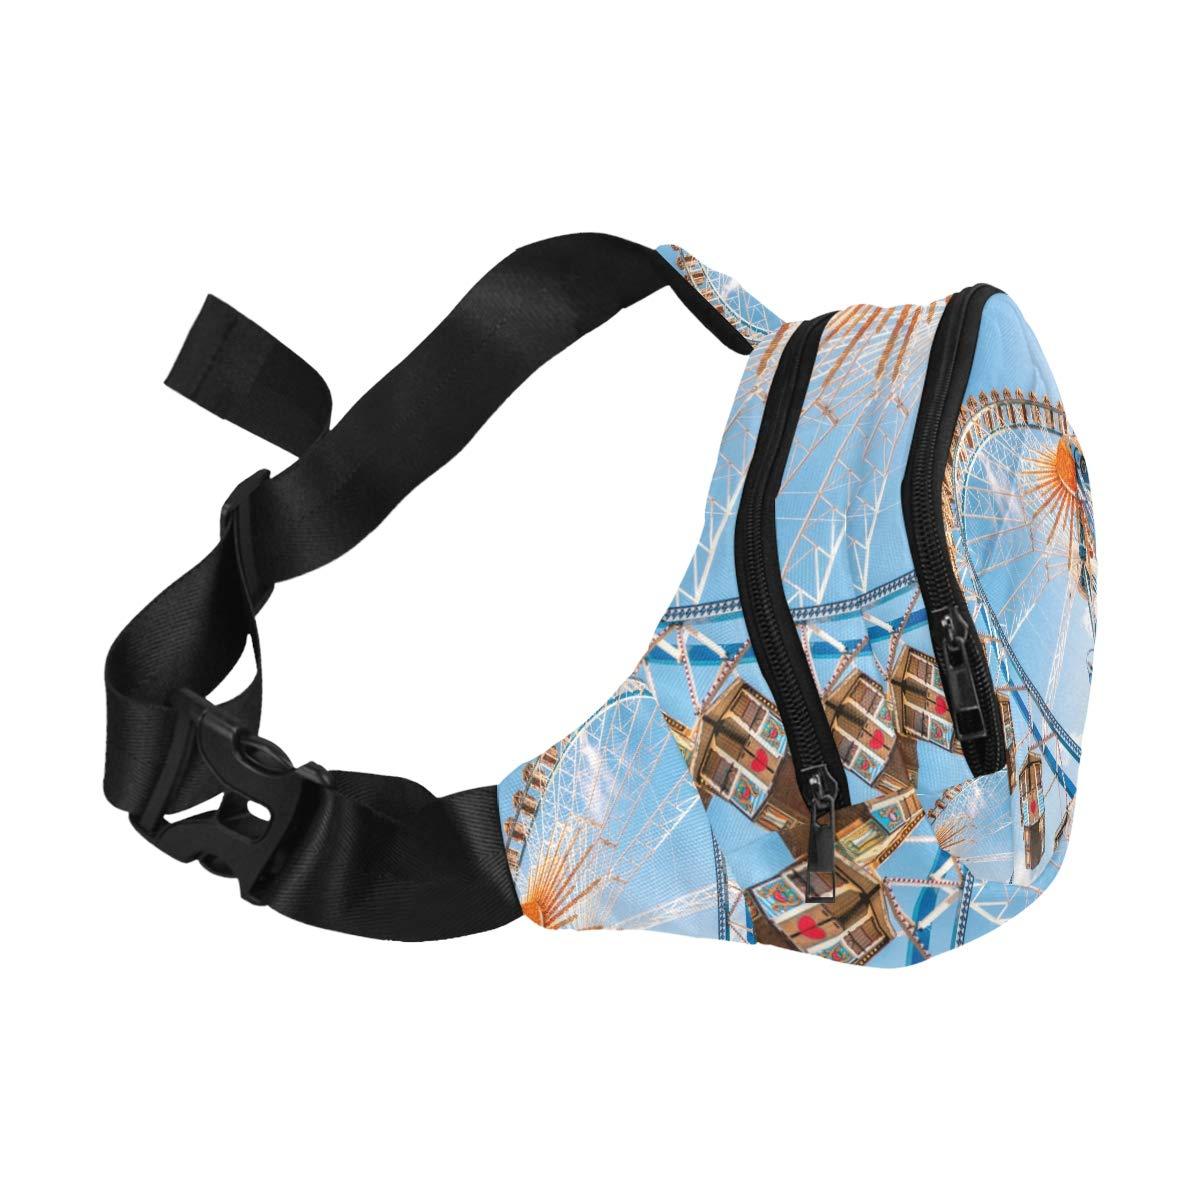 A Colourful Ferris Wheel Daytime Fenny Packs Waist Bags Adjustable Belt Waterproof Nylon Travel Running Sport Vacation Party For Men Women Boys Girls Kids